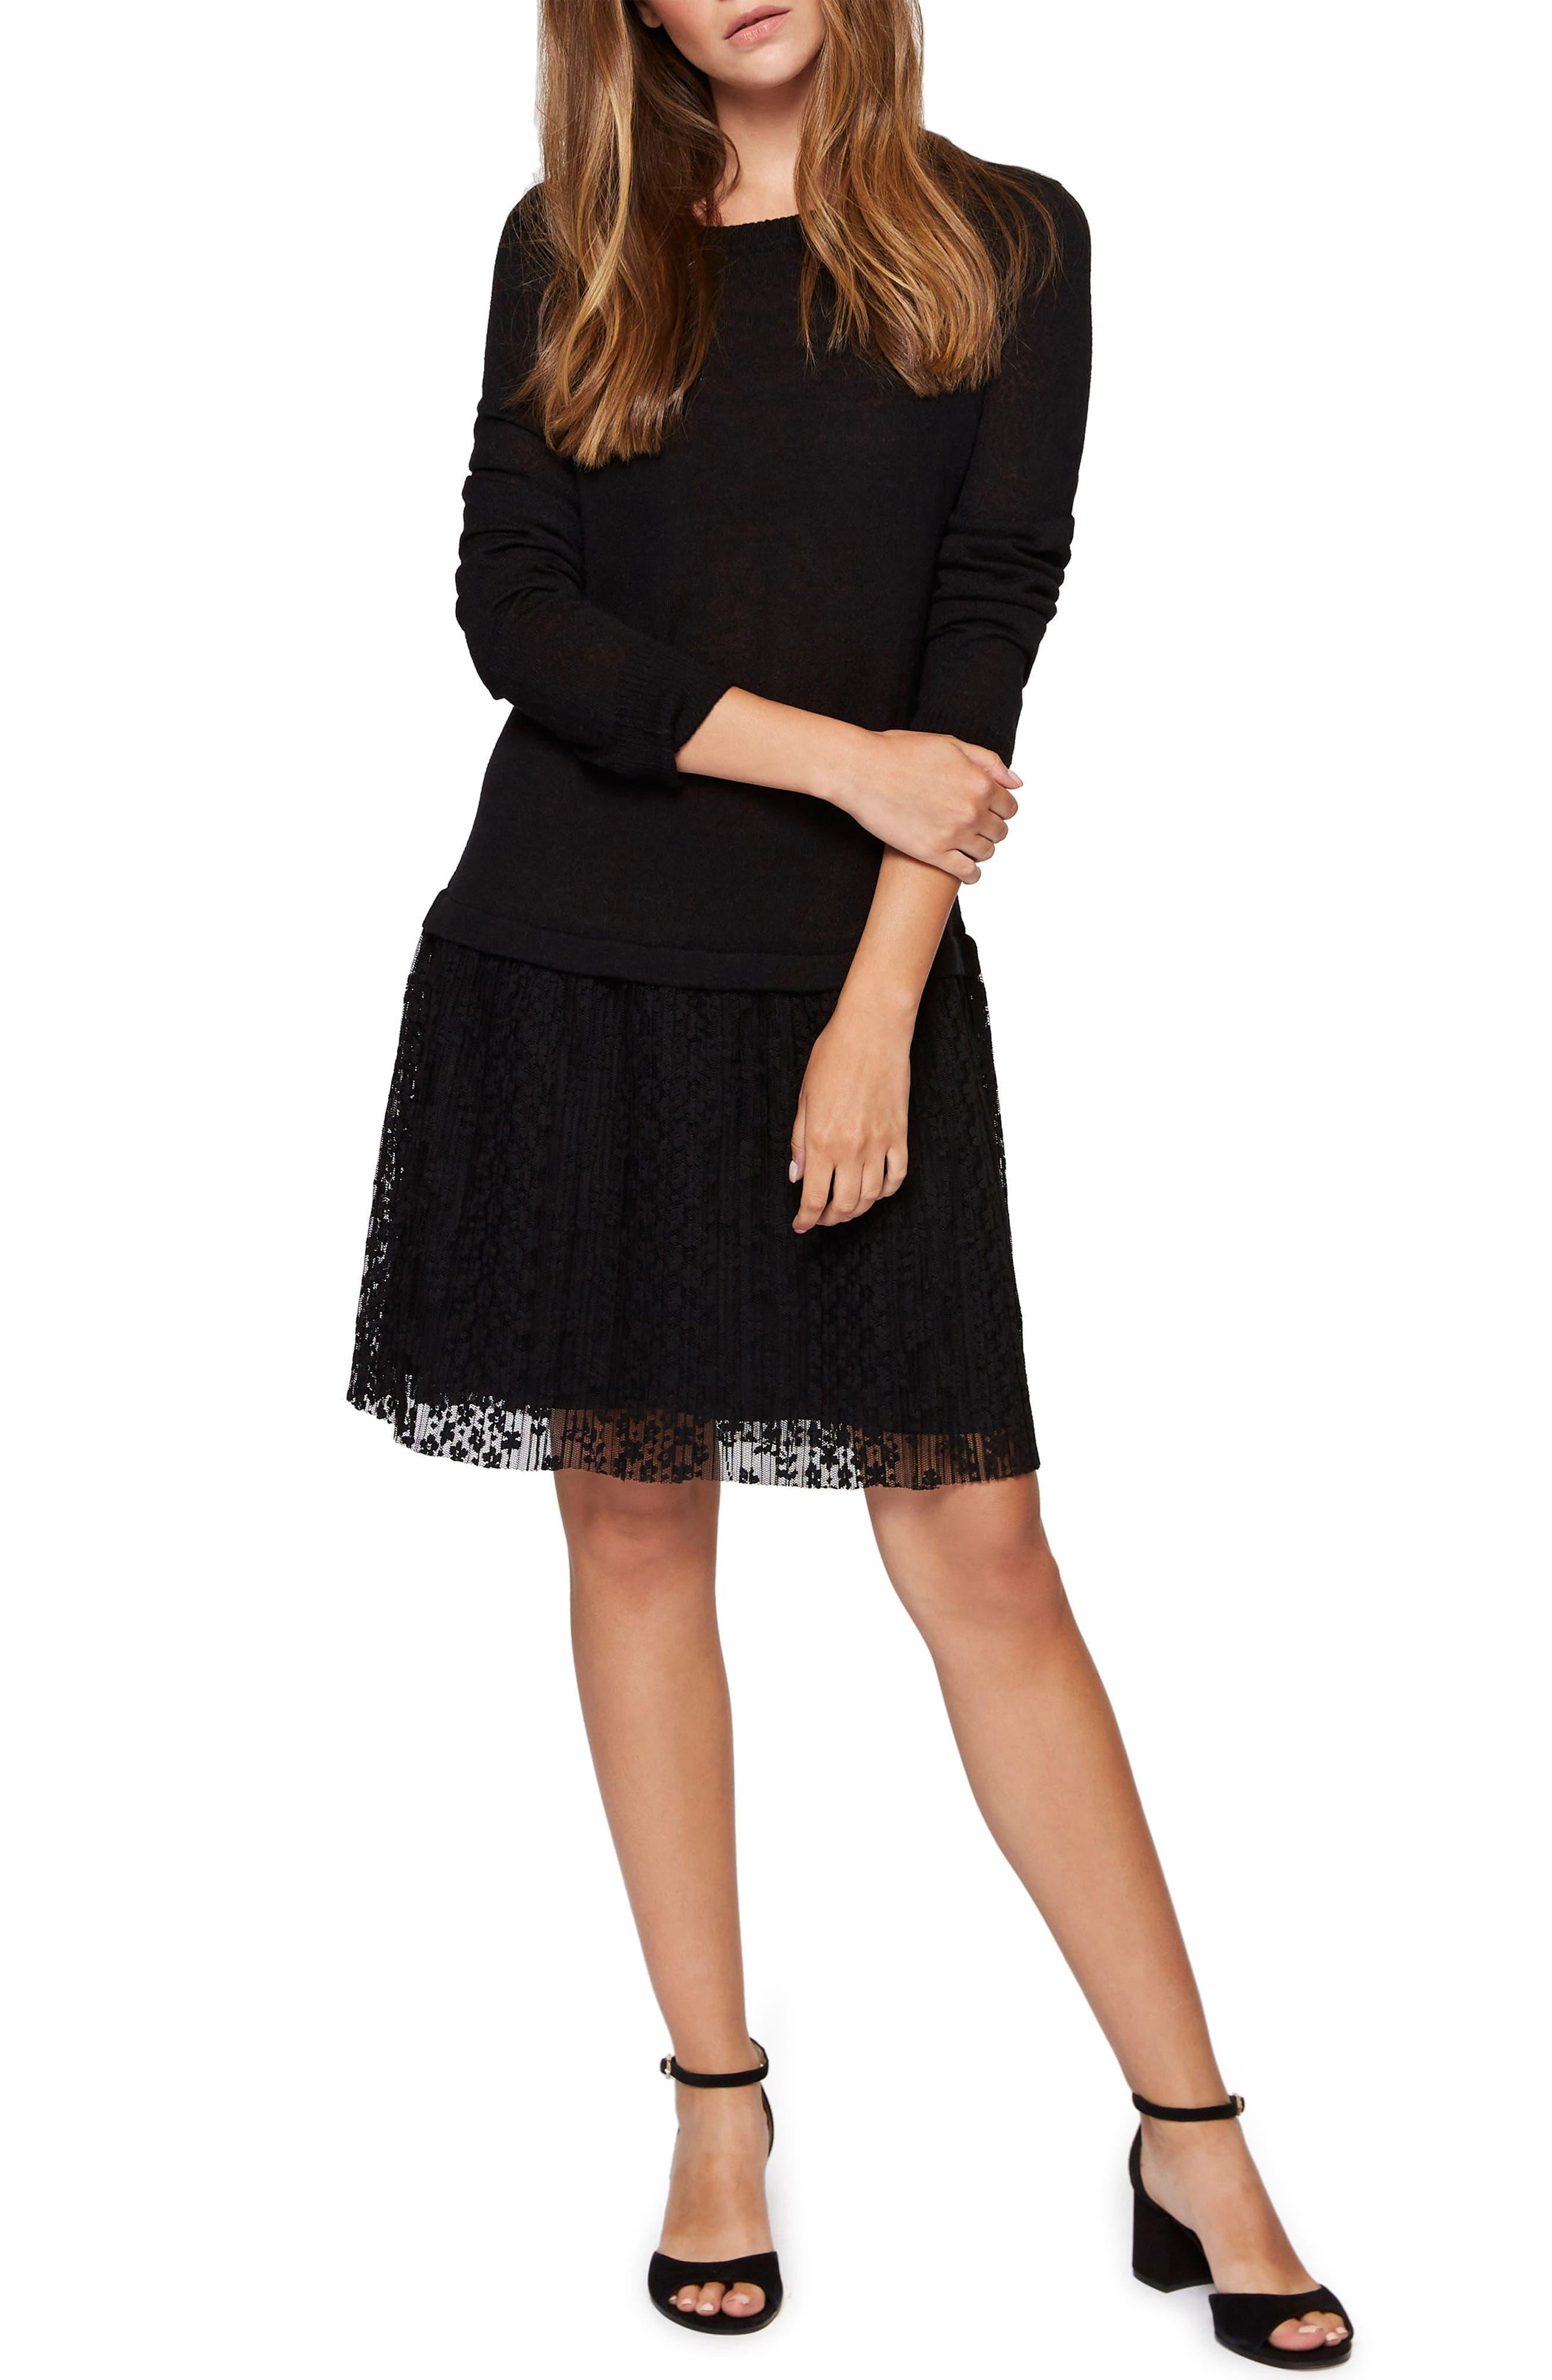 Main Image - Sanctuary Sophie Lace Skirt Sweater Dress